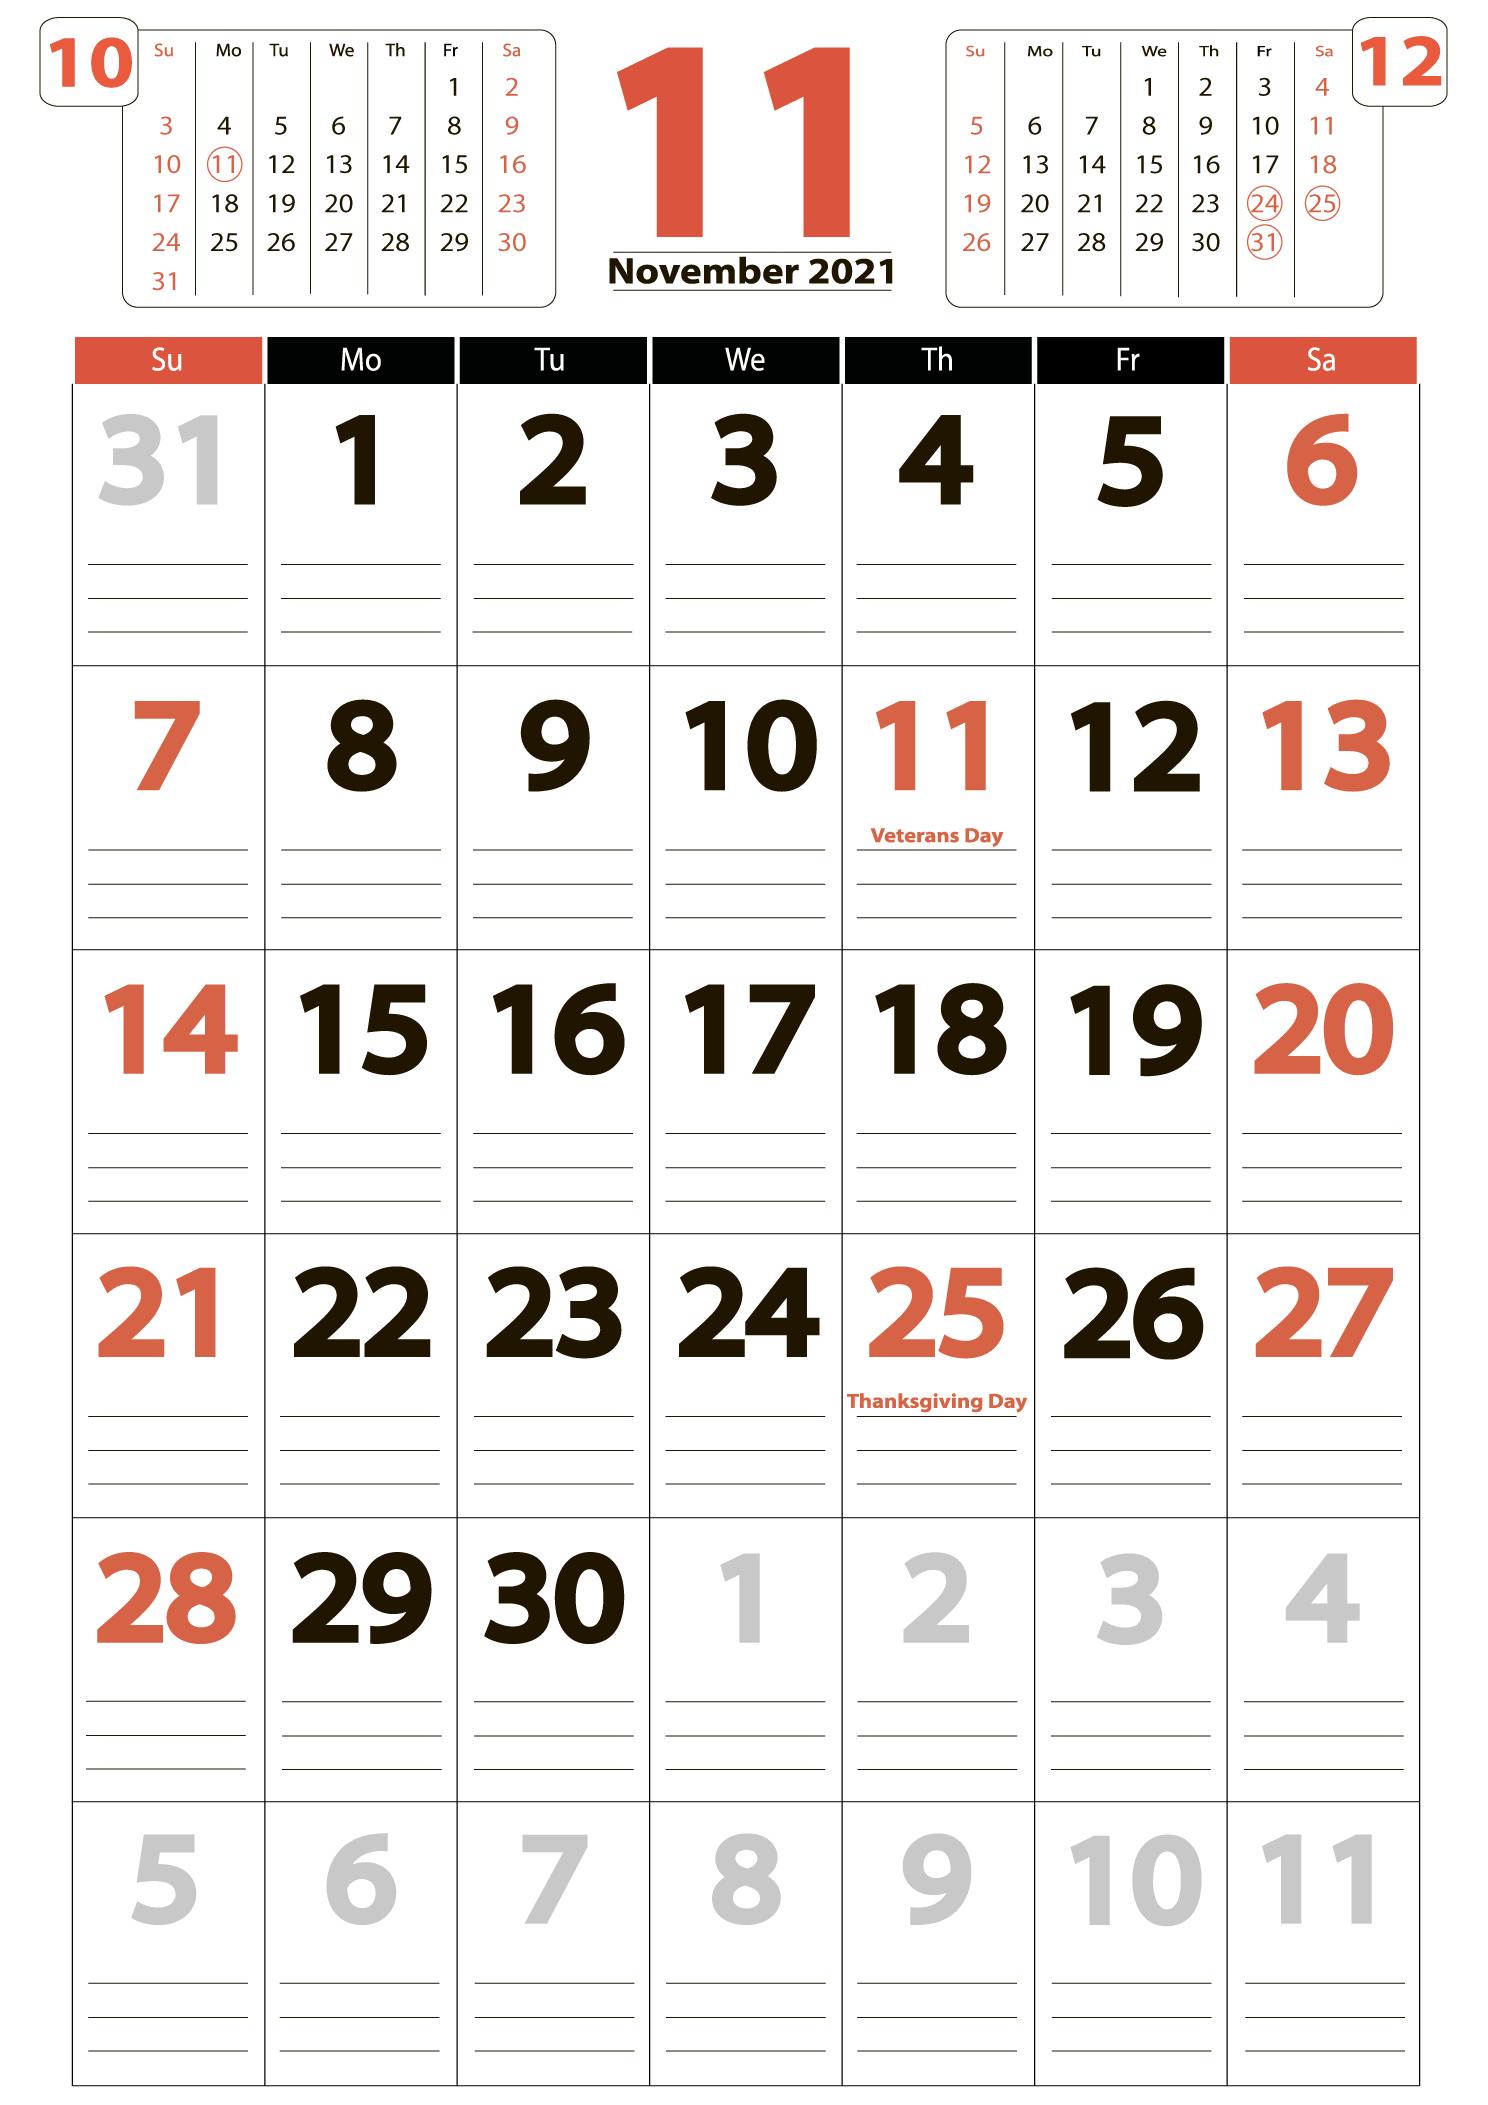 November 2021 calendar portrait download